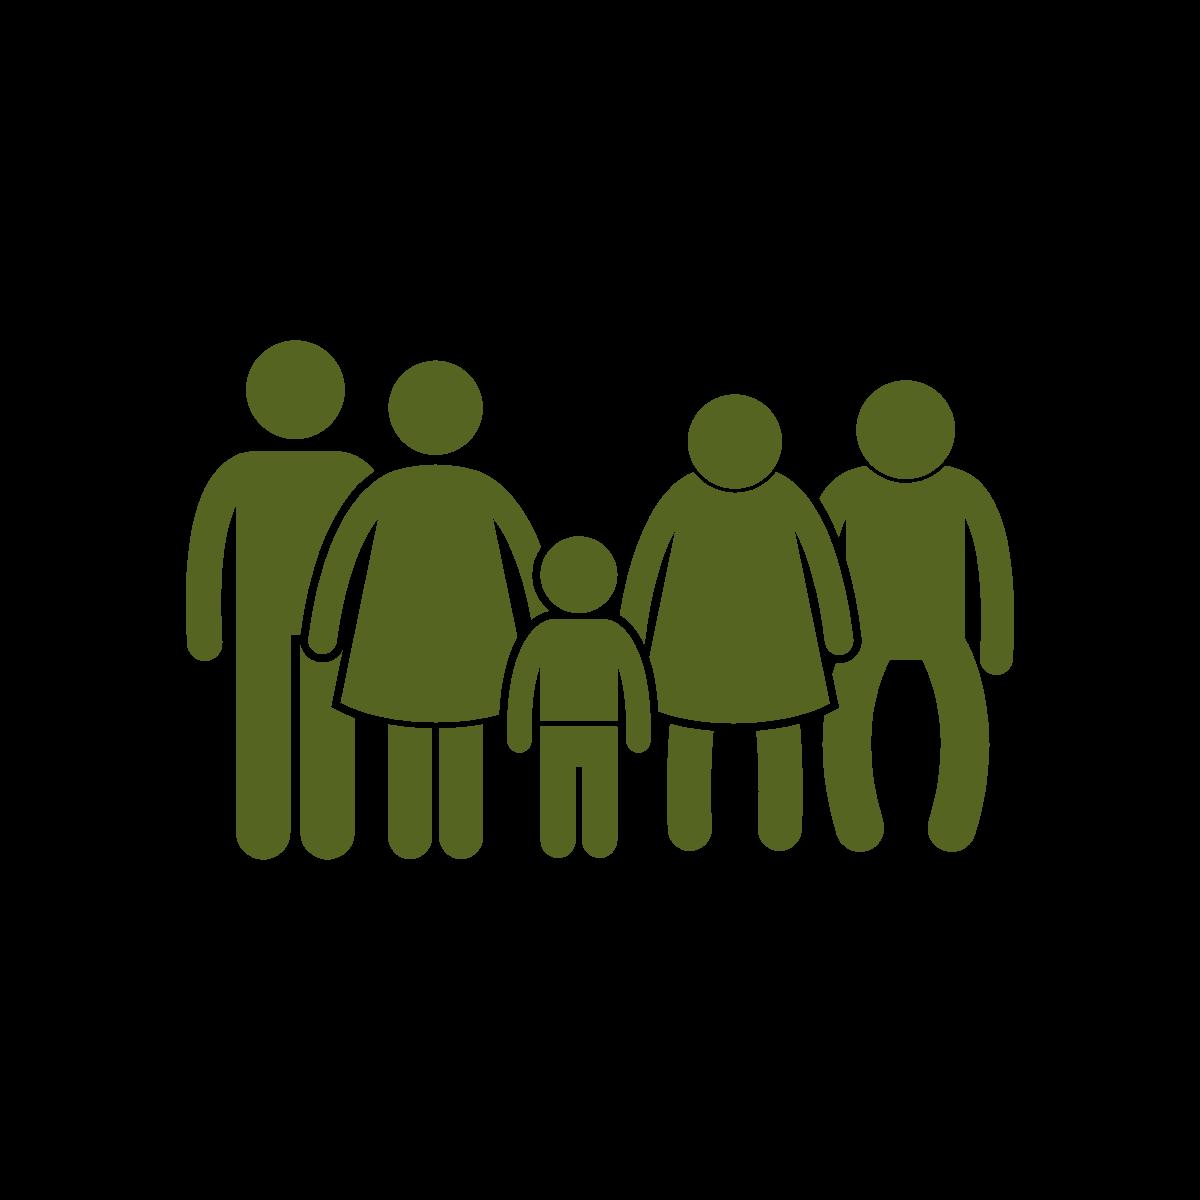 noun_Family_1915285